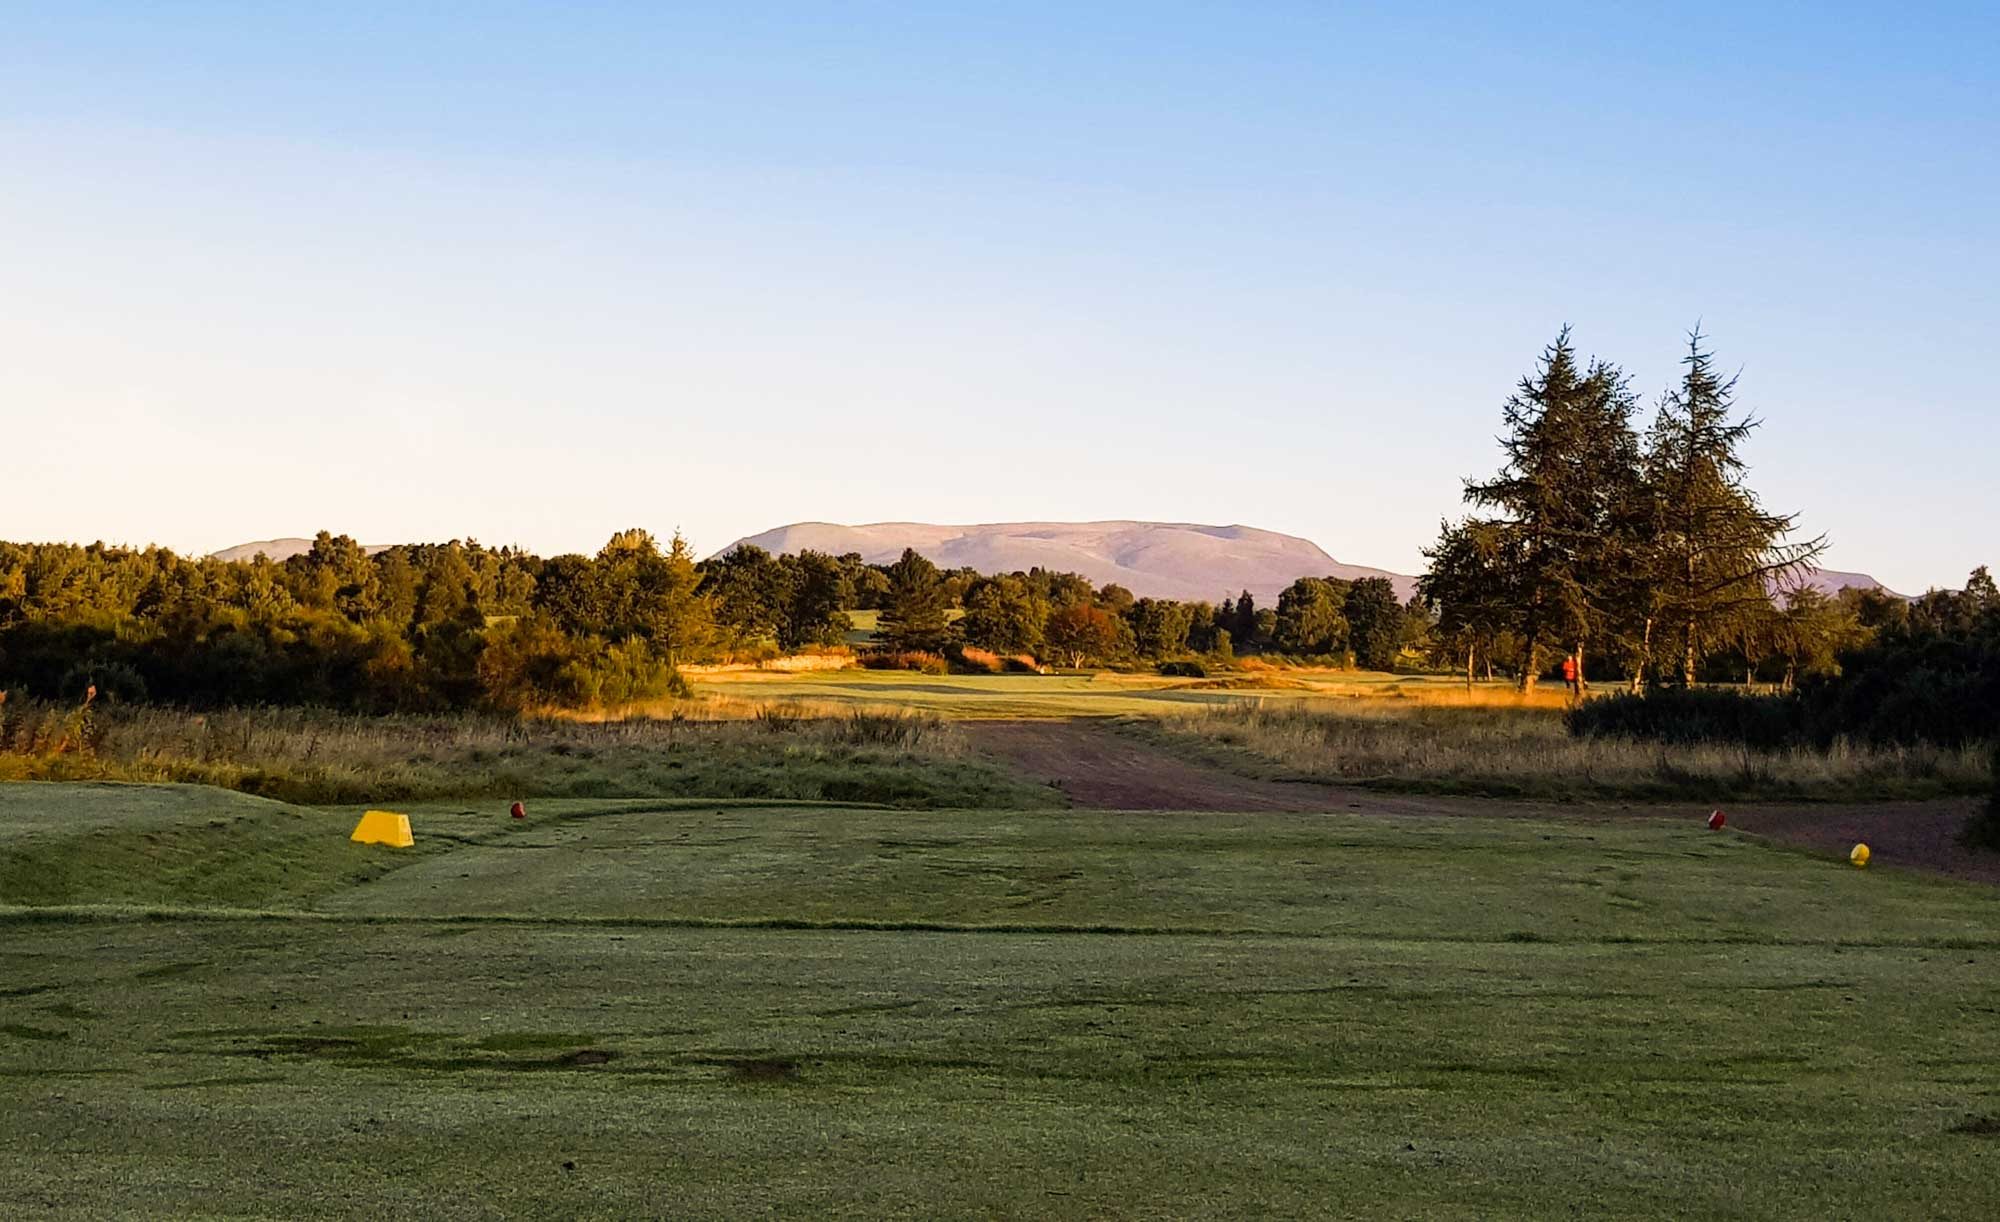 The heathland golf on offer at Muir of Ord Golf Club.